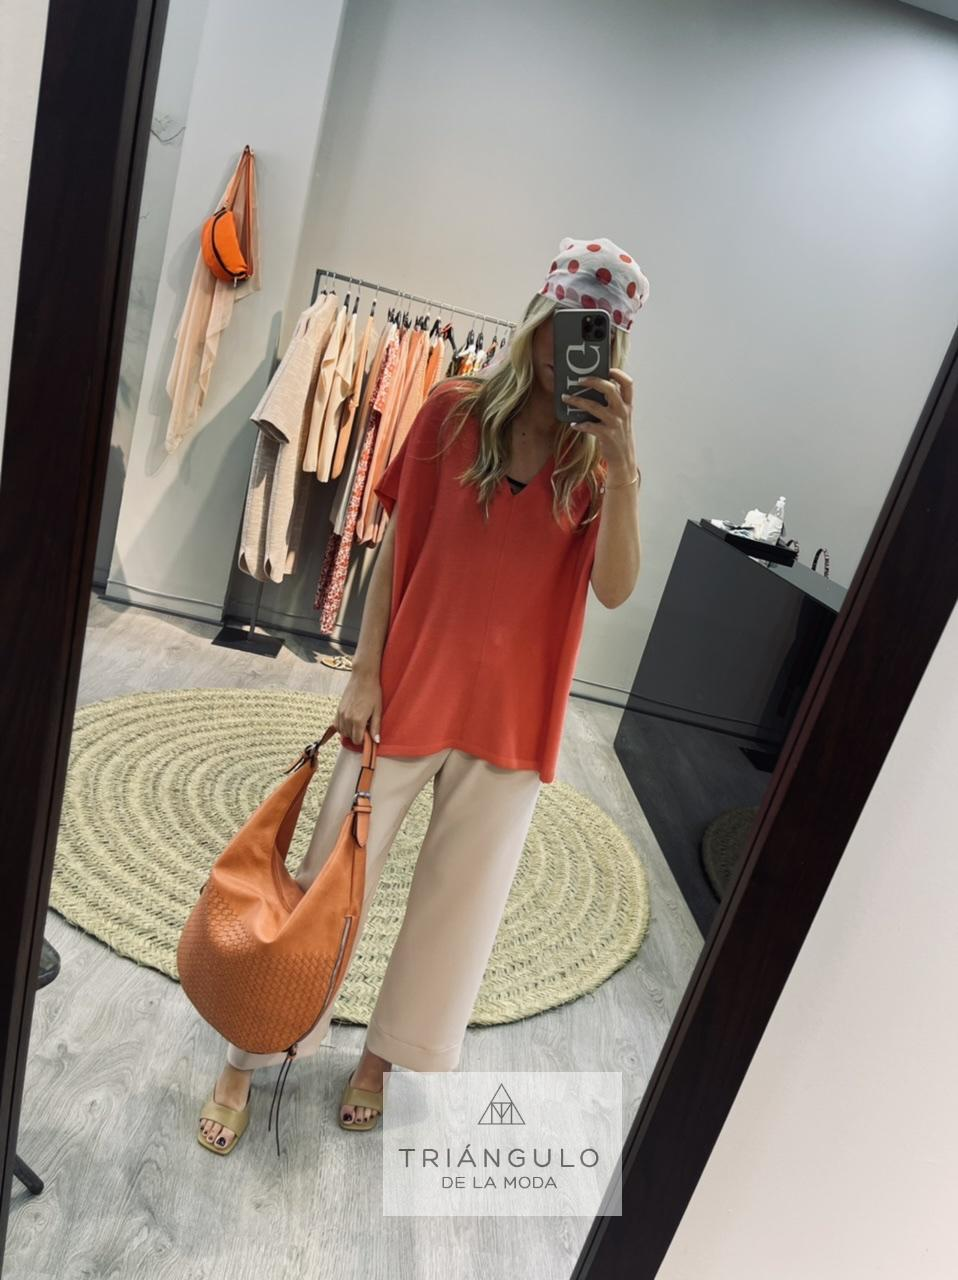 Tienda online del Triangulo de la Moda Jersey pico basico